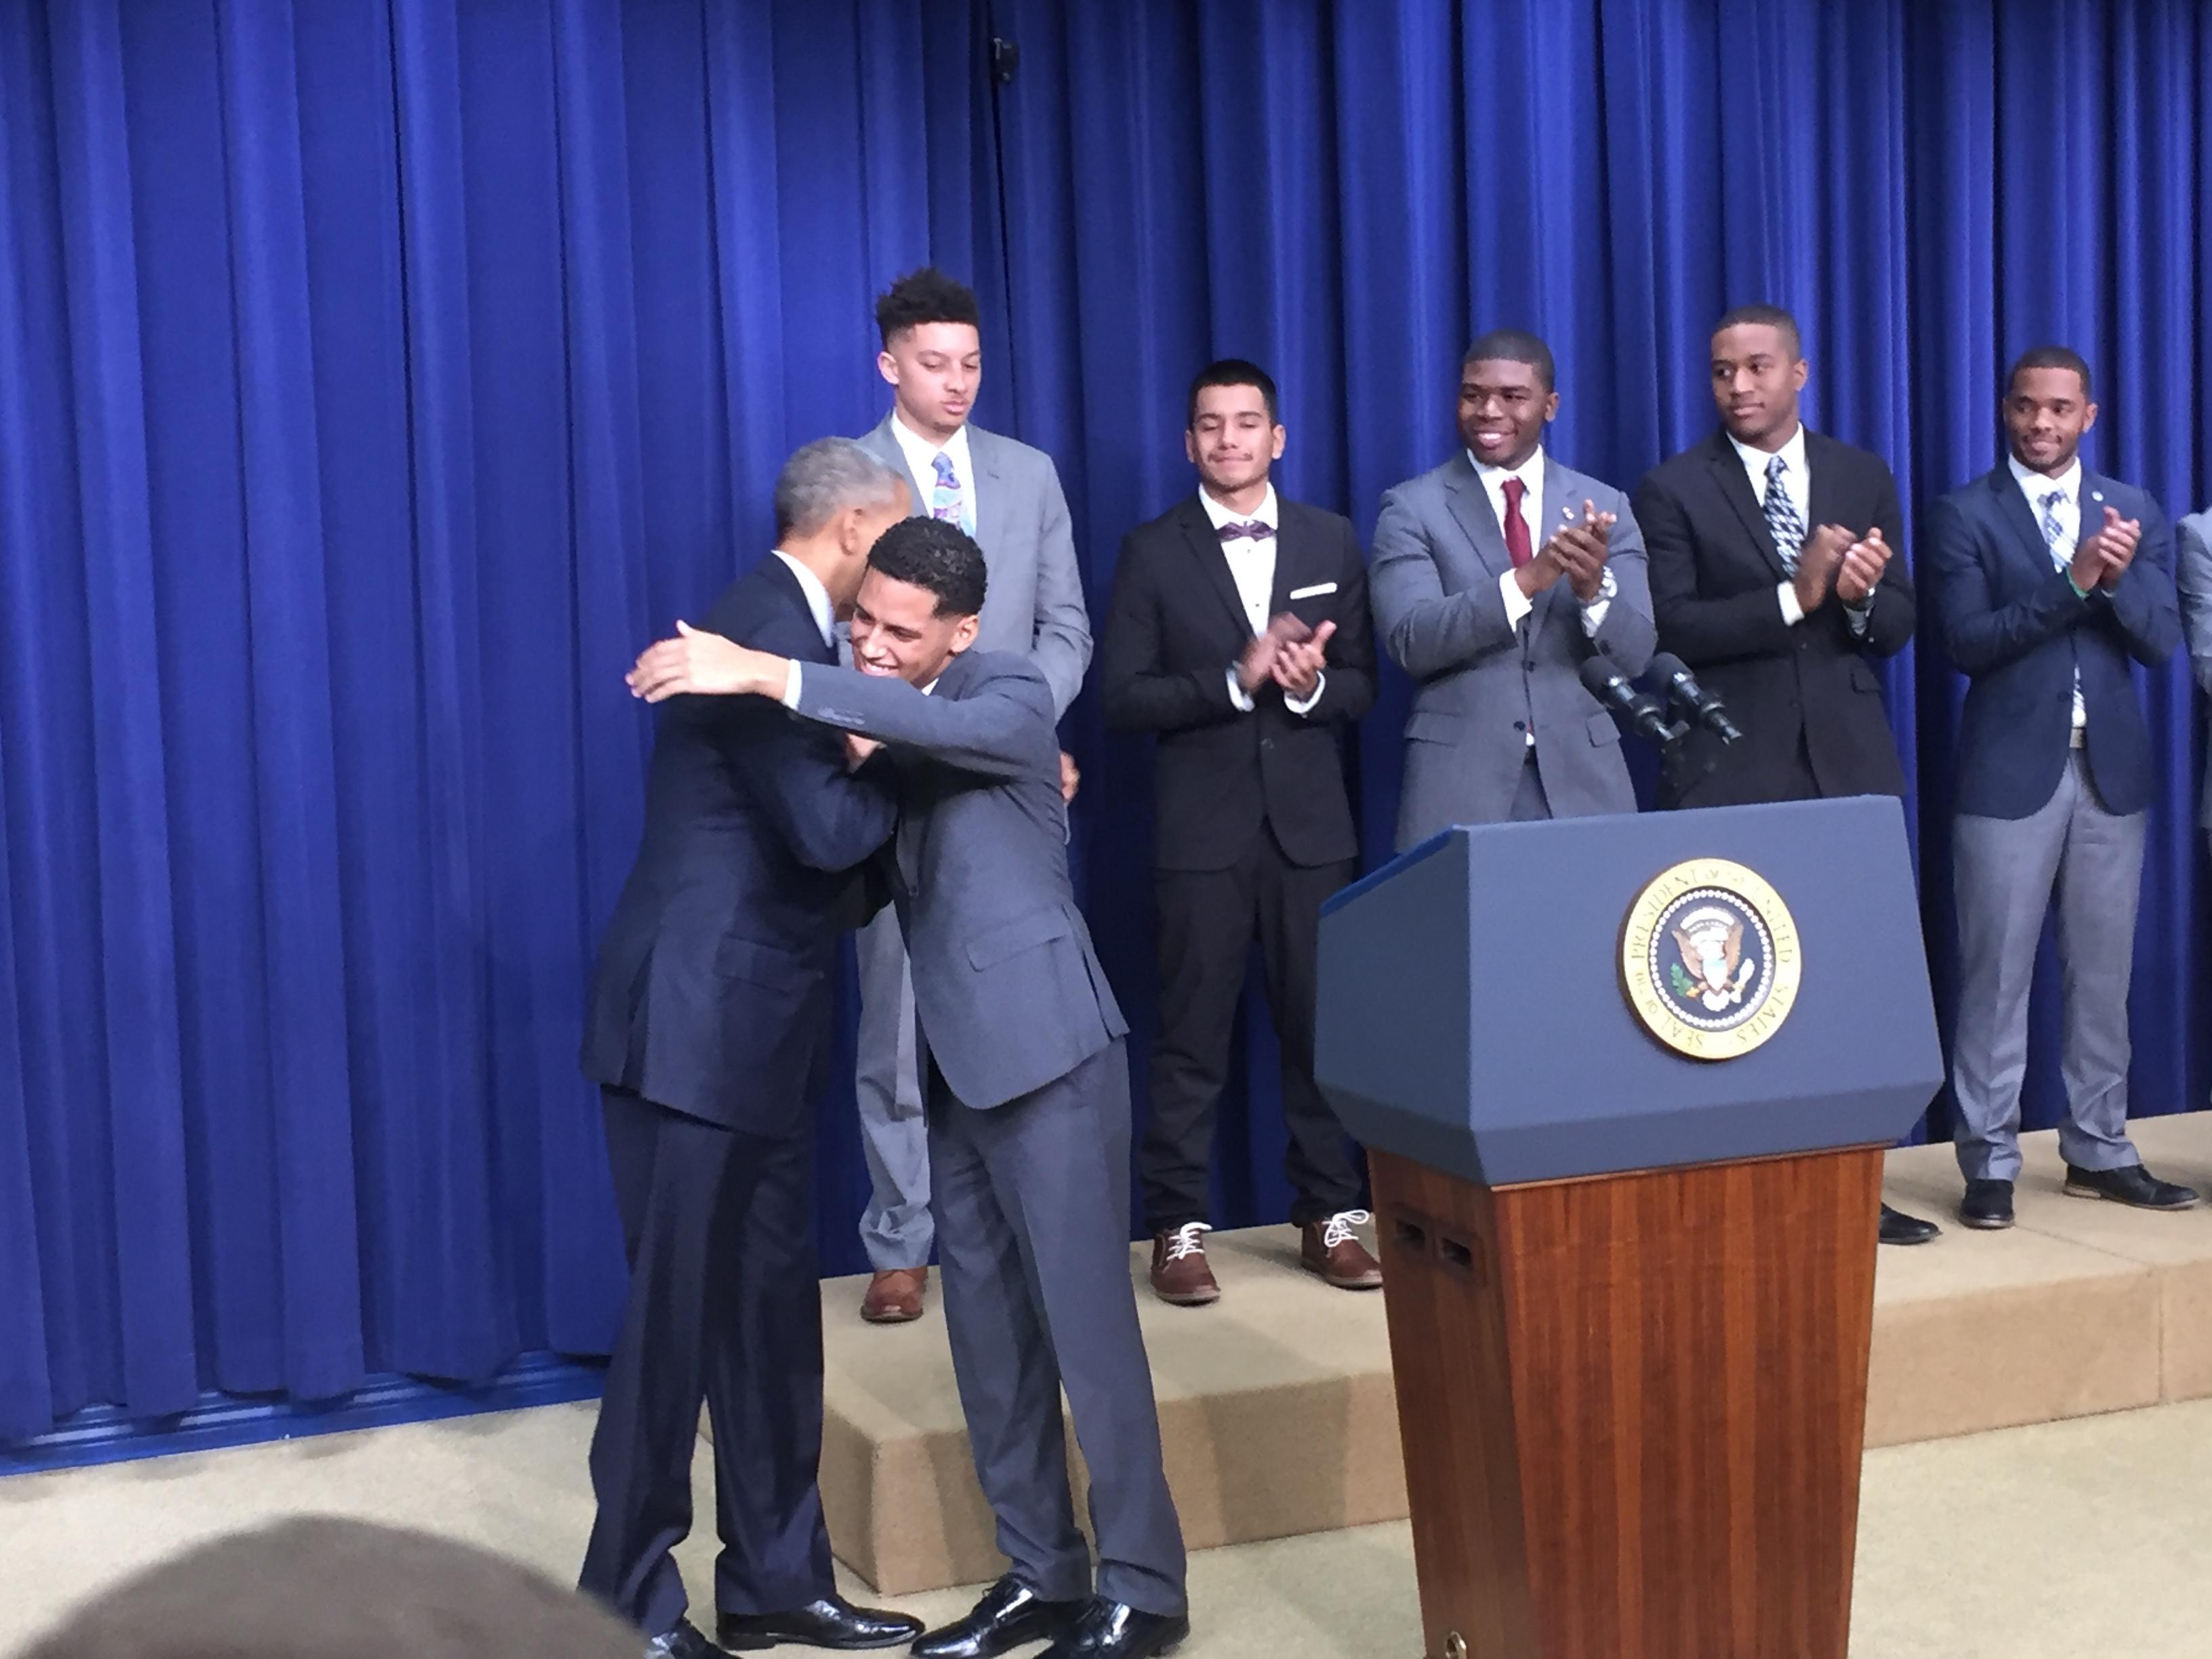 Luis Ramirez Barack Obama Hug 2